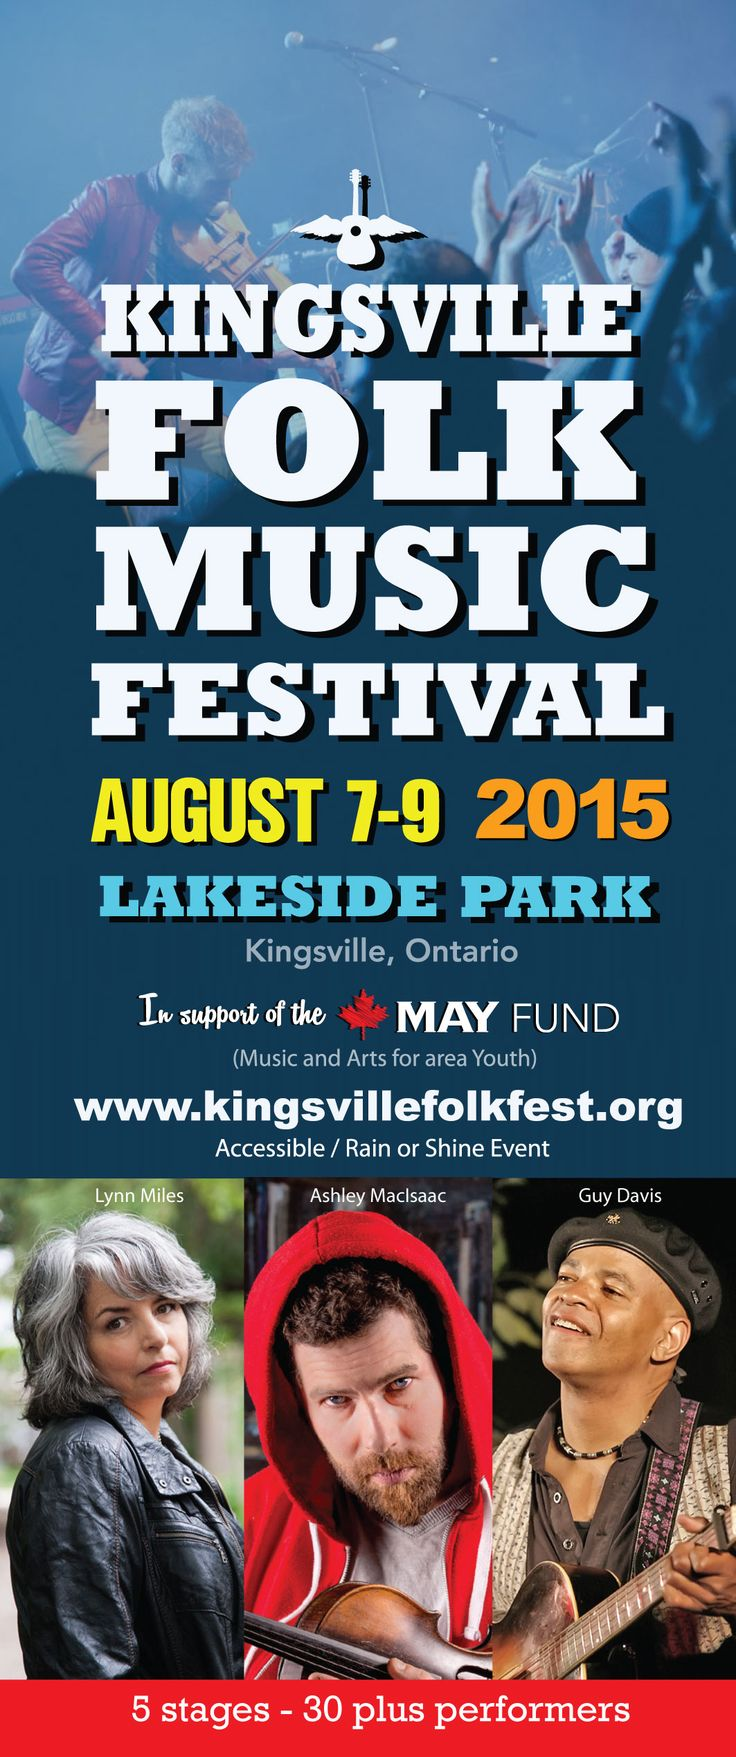 Kingsville Folk Music Festival ~ Aug 7-9 2015 at Lakeside Park in Kingsville Ontario. 5 stages, more than 100 performances and 30 plus performers! www.kingsvillefolkfest.org